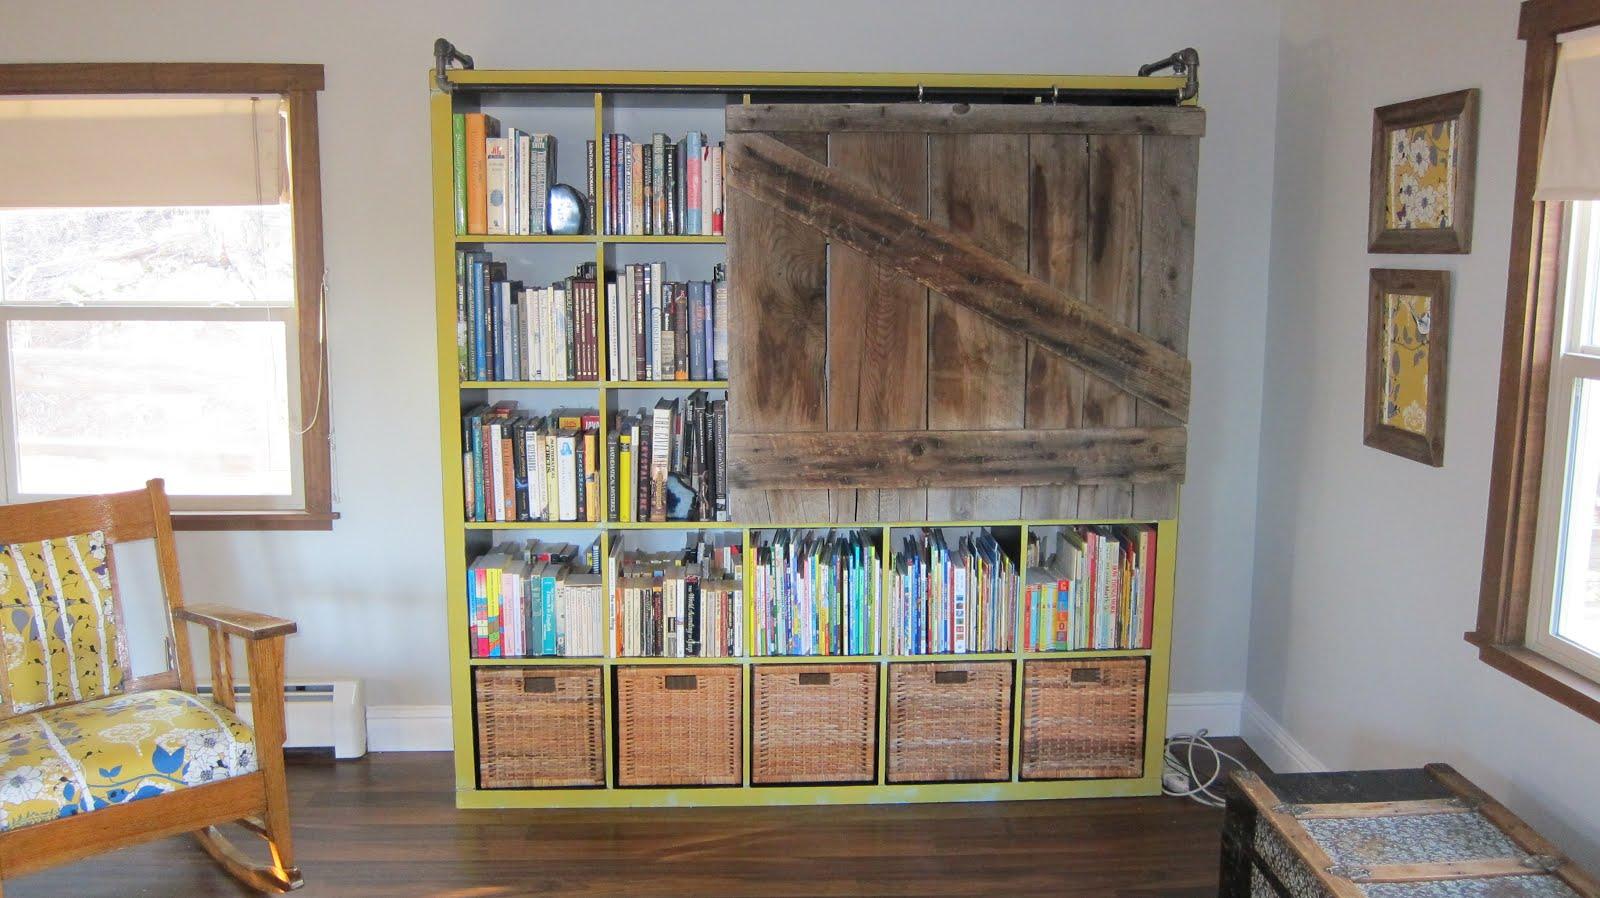 expedit bookshelf turned rustic tv cabinet bookshelf. Black Bedroom Furniture Sets. Home Design Ideas